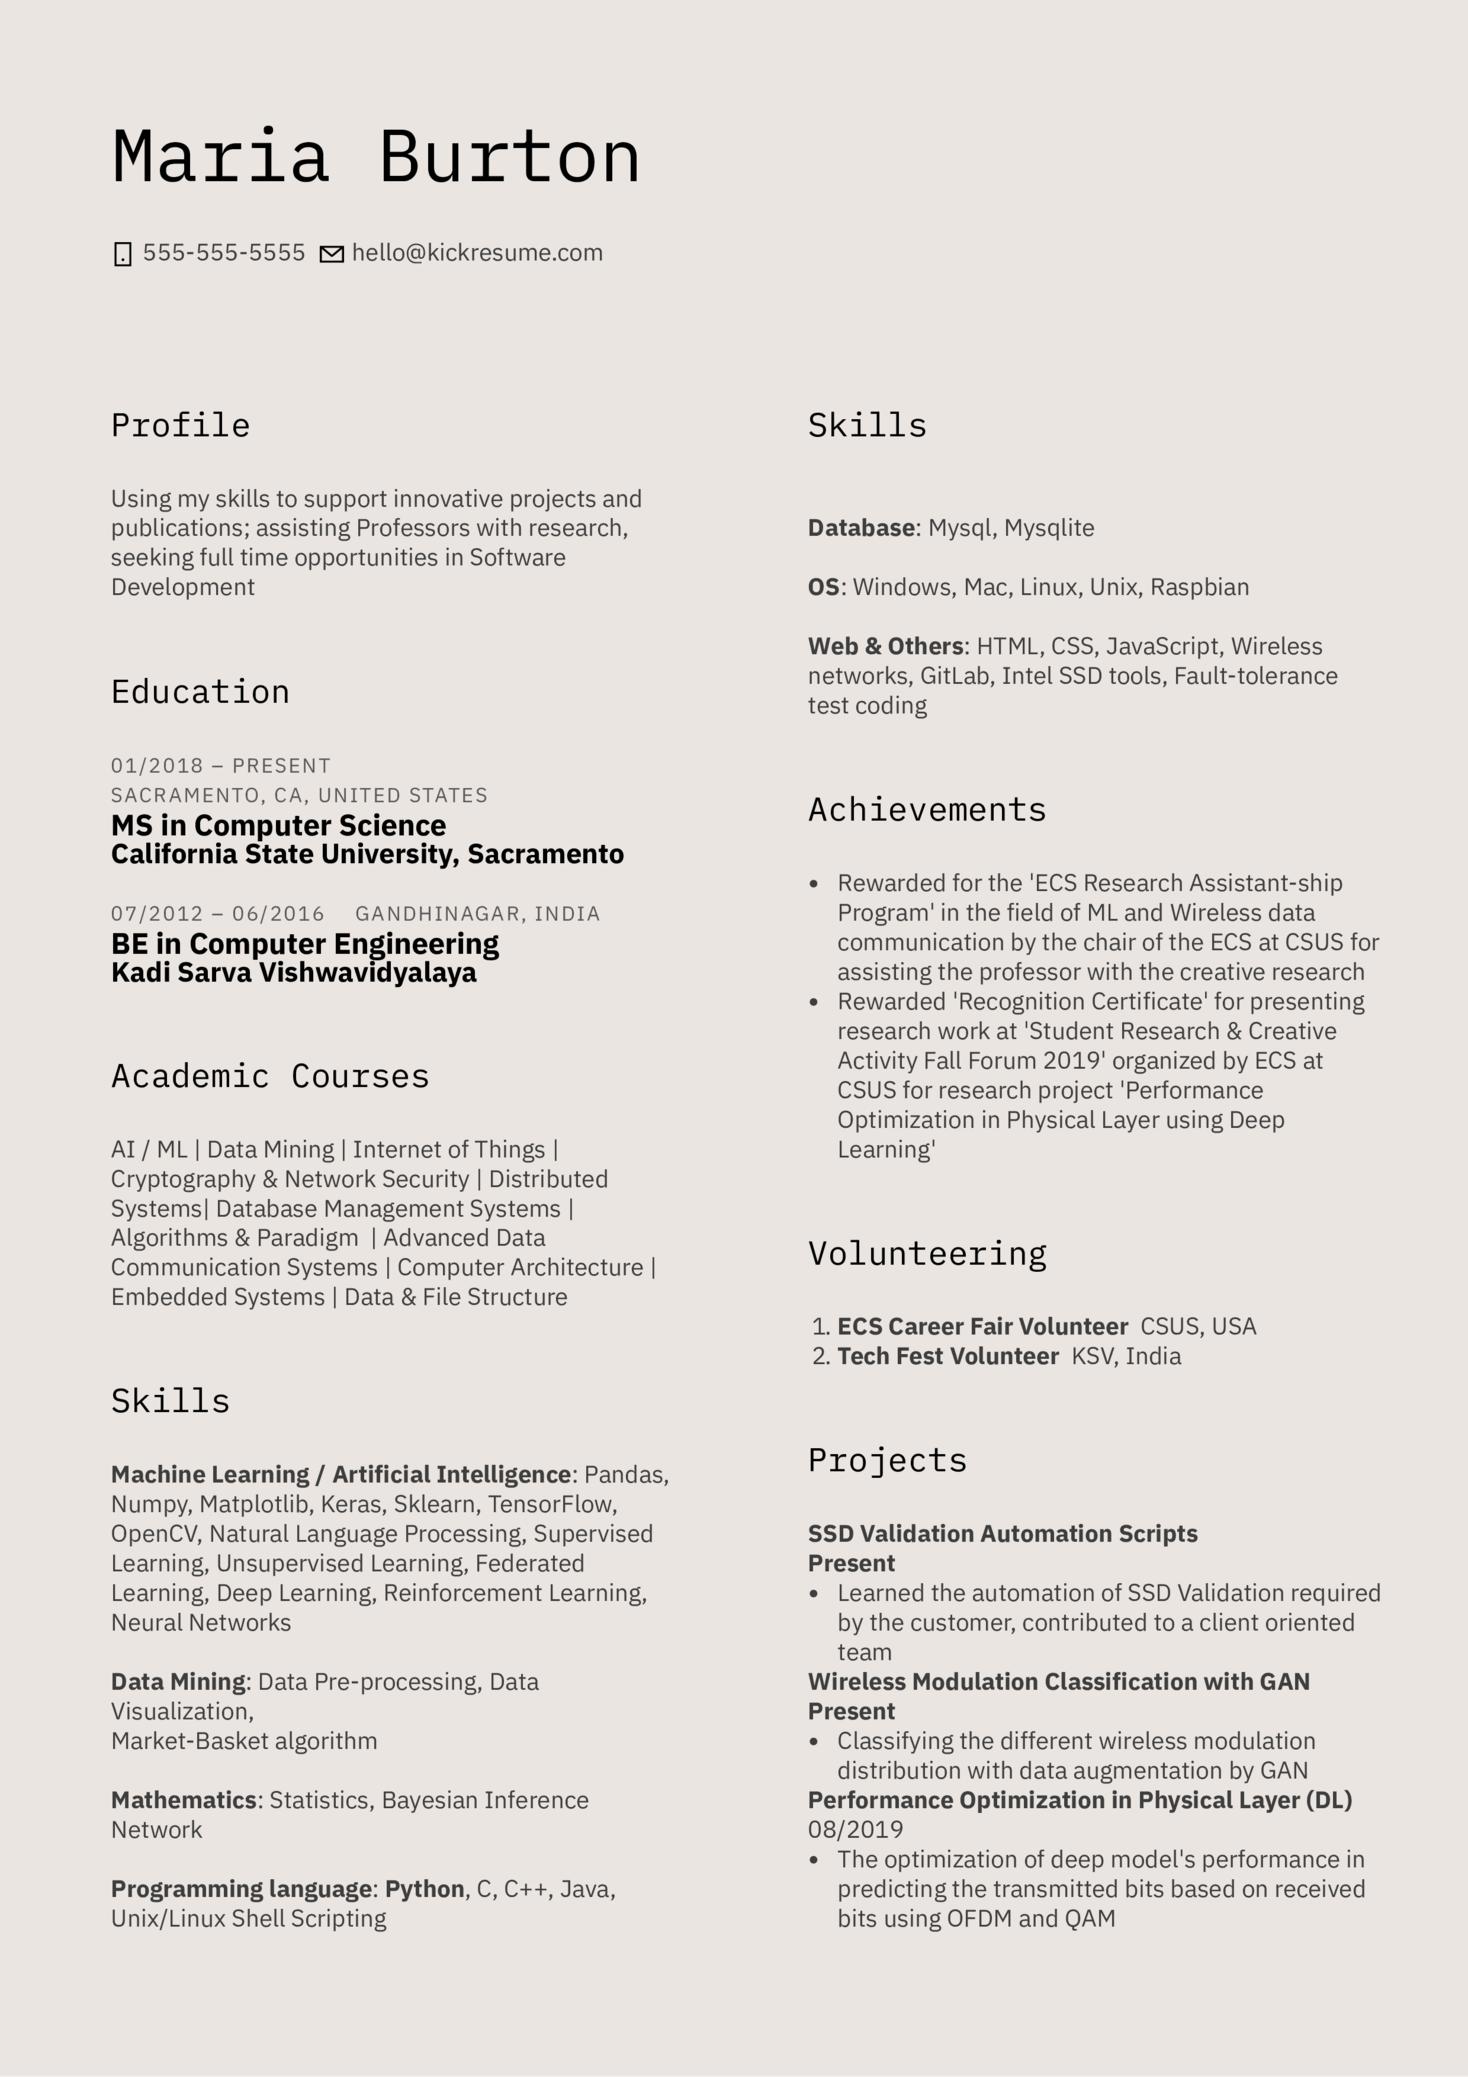 Intel Graduate Intern Resume Example (parte 1)